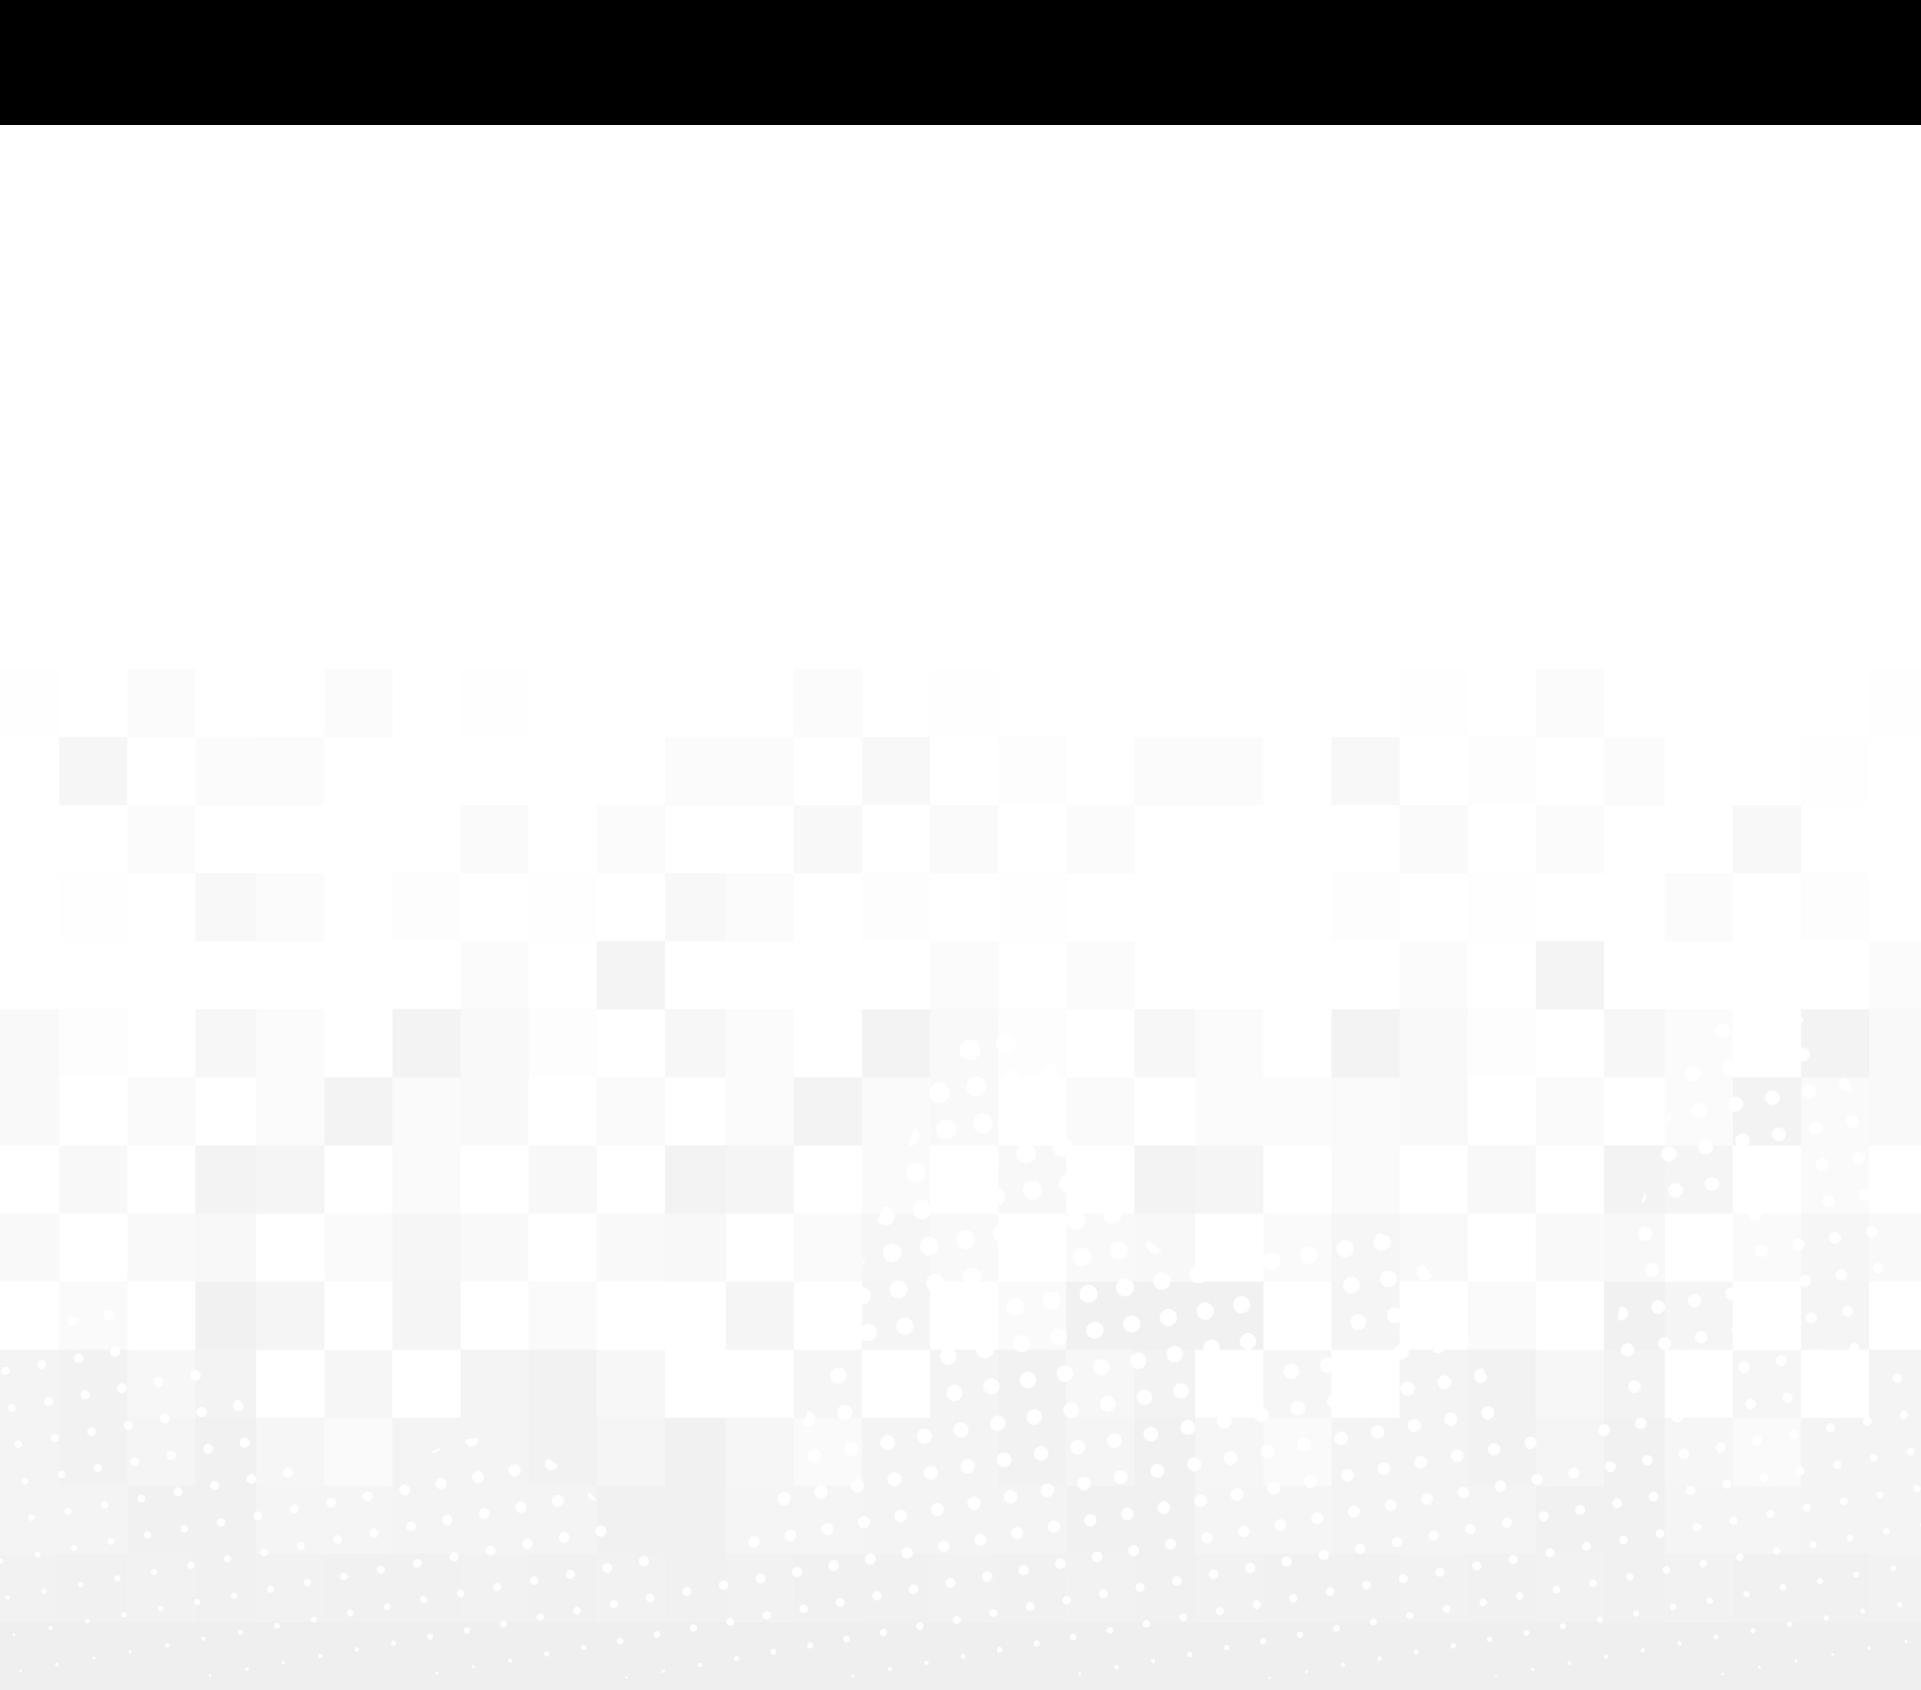 WinAutomationイメージ